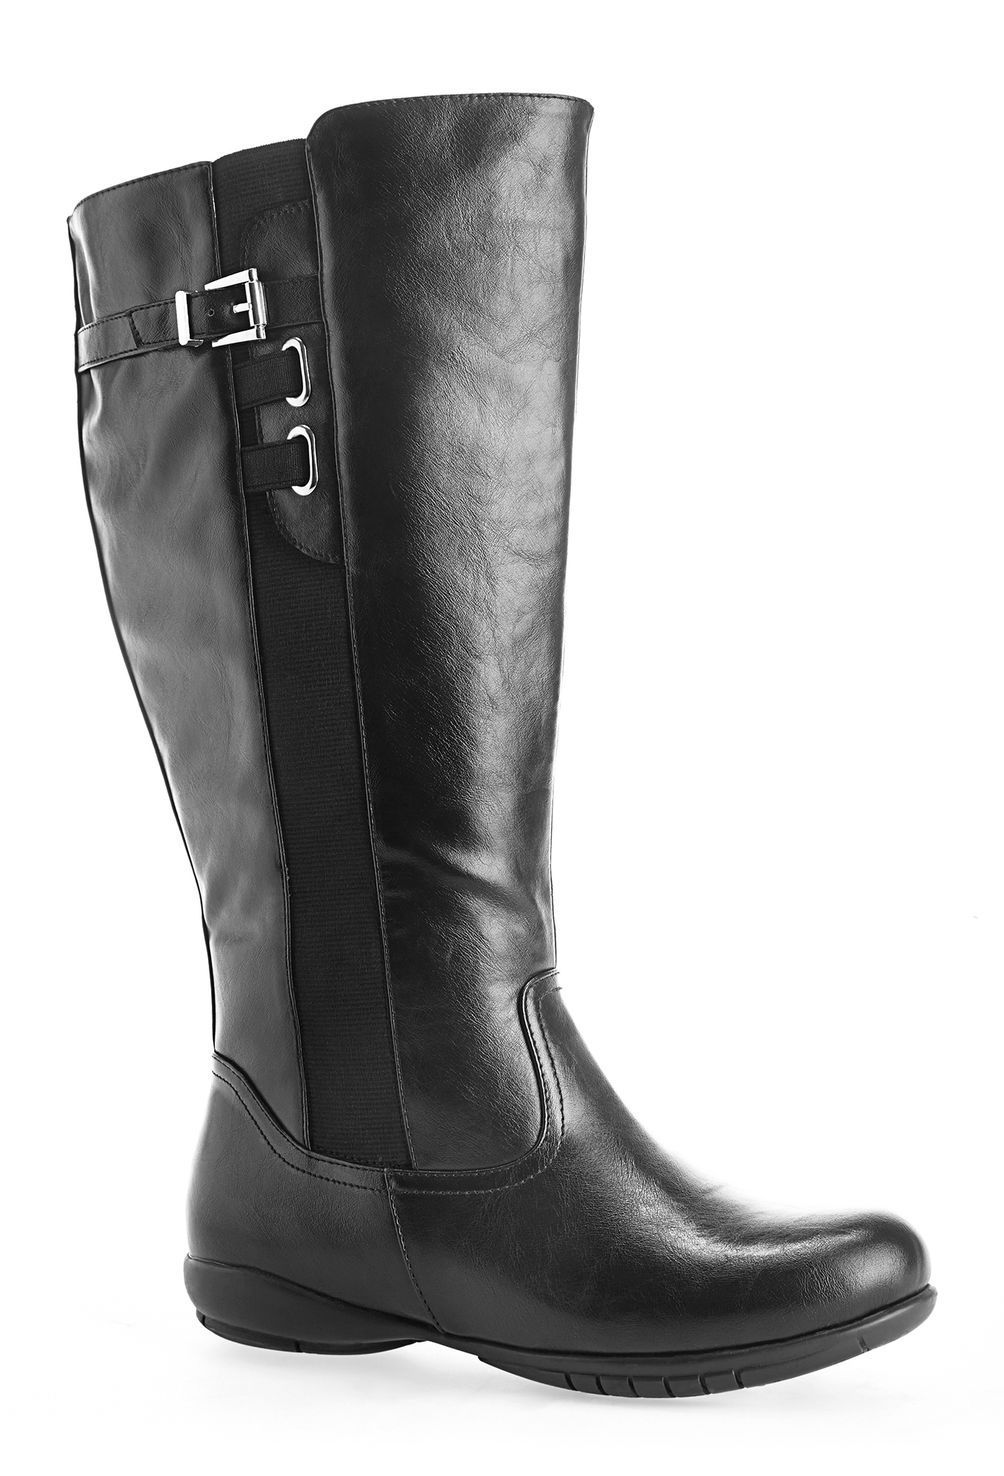 b7d62276585 Mainz Tall Stretch Side Boot-Wide Width Boot-Avenue